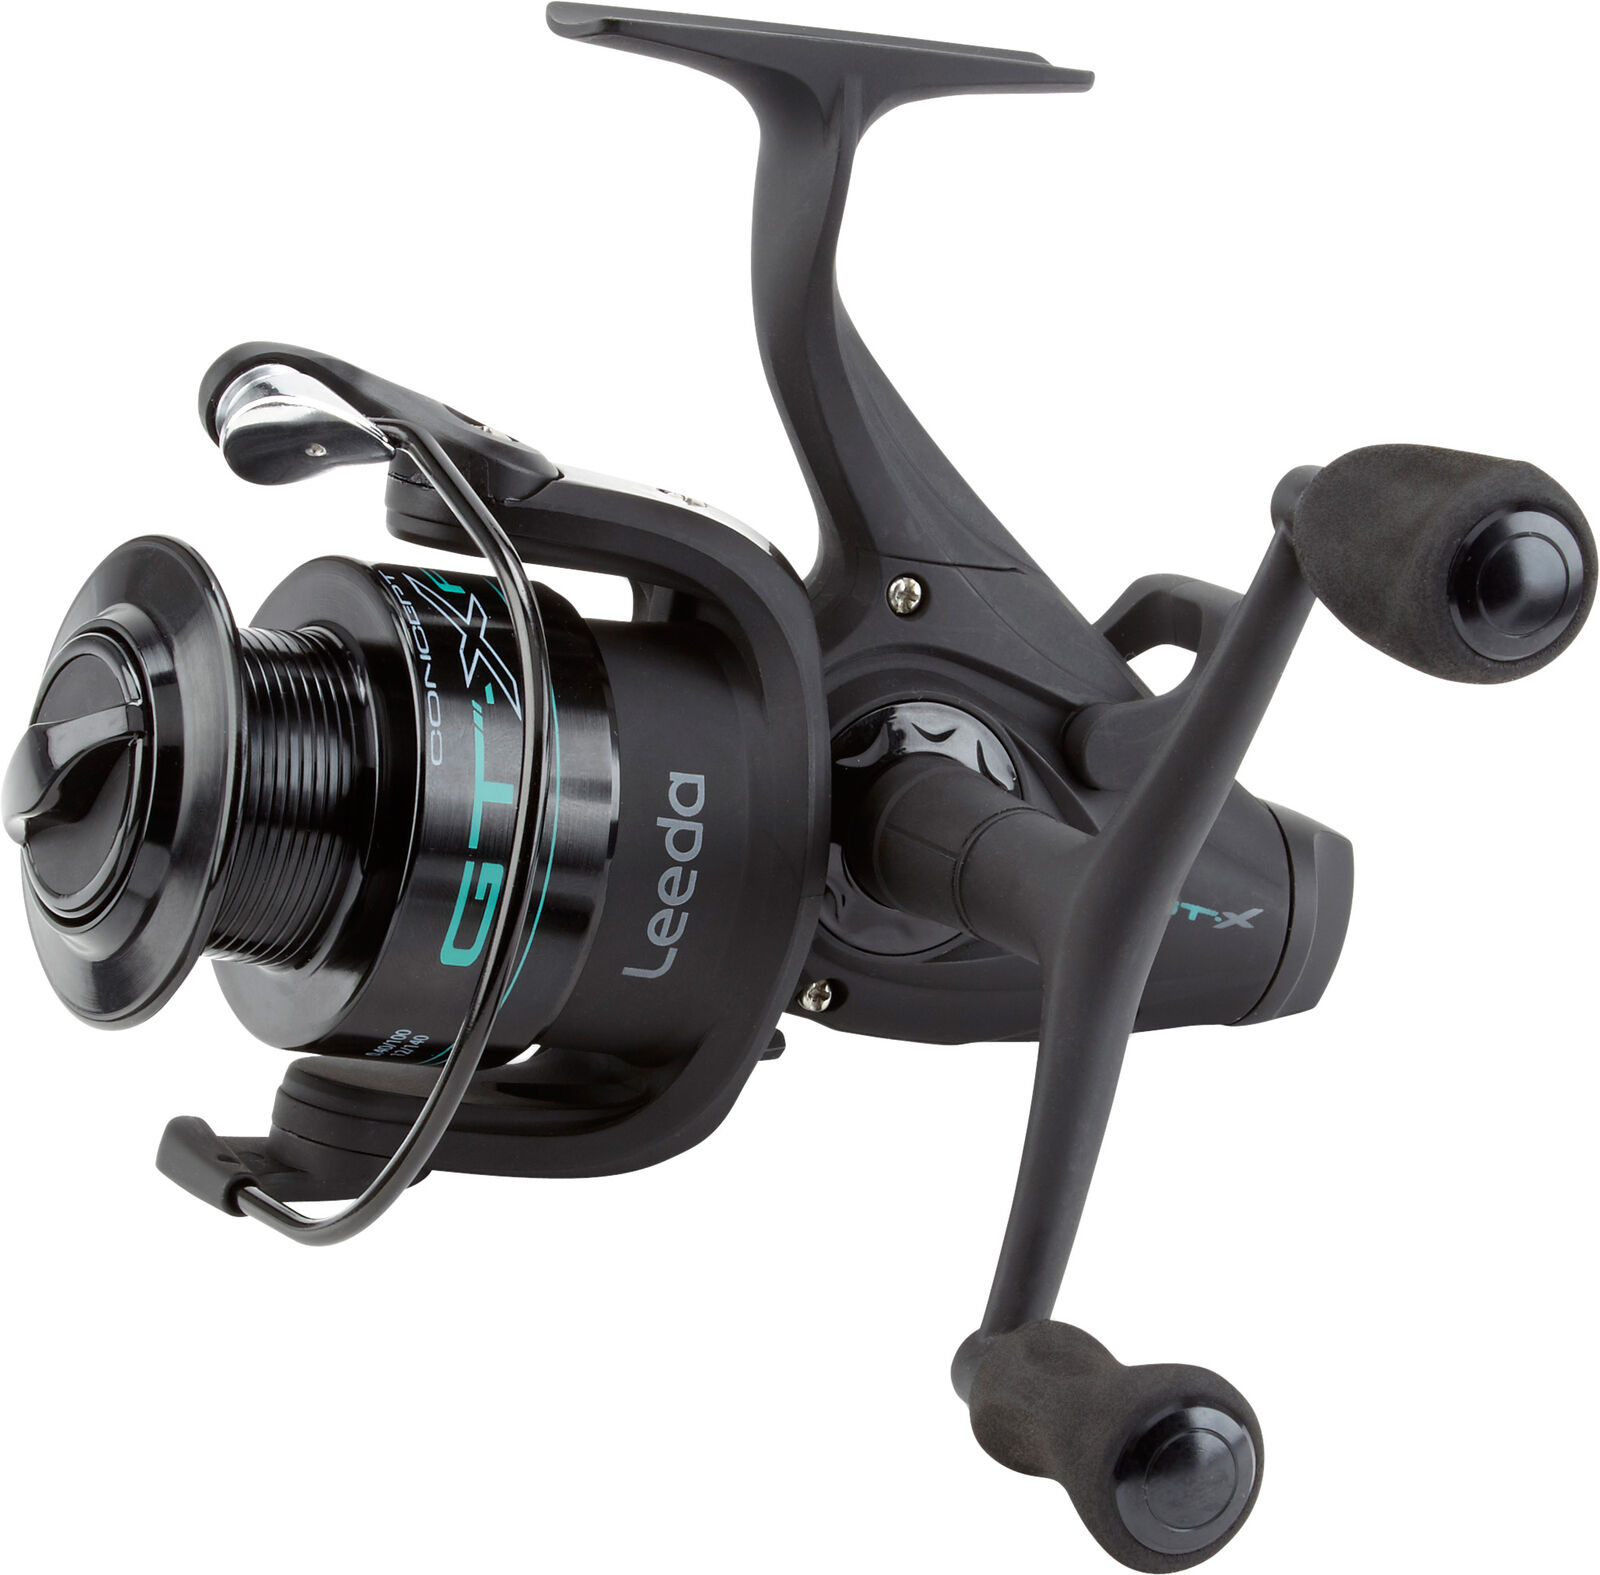 Leeda - Concept GT-X  40 FS Reel For Carp, Match, Coarse Fishing  floor price